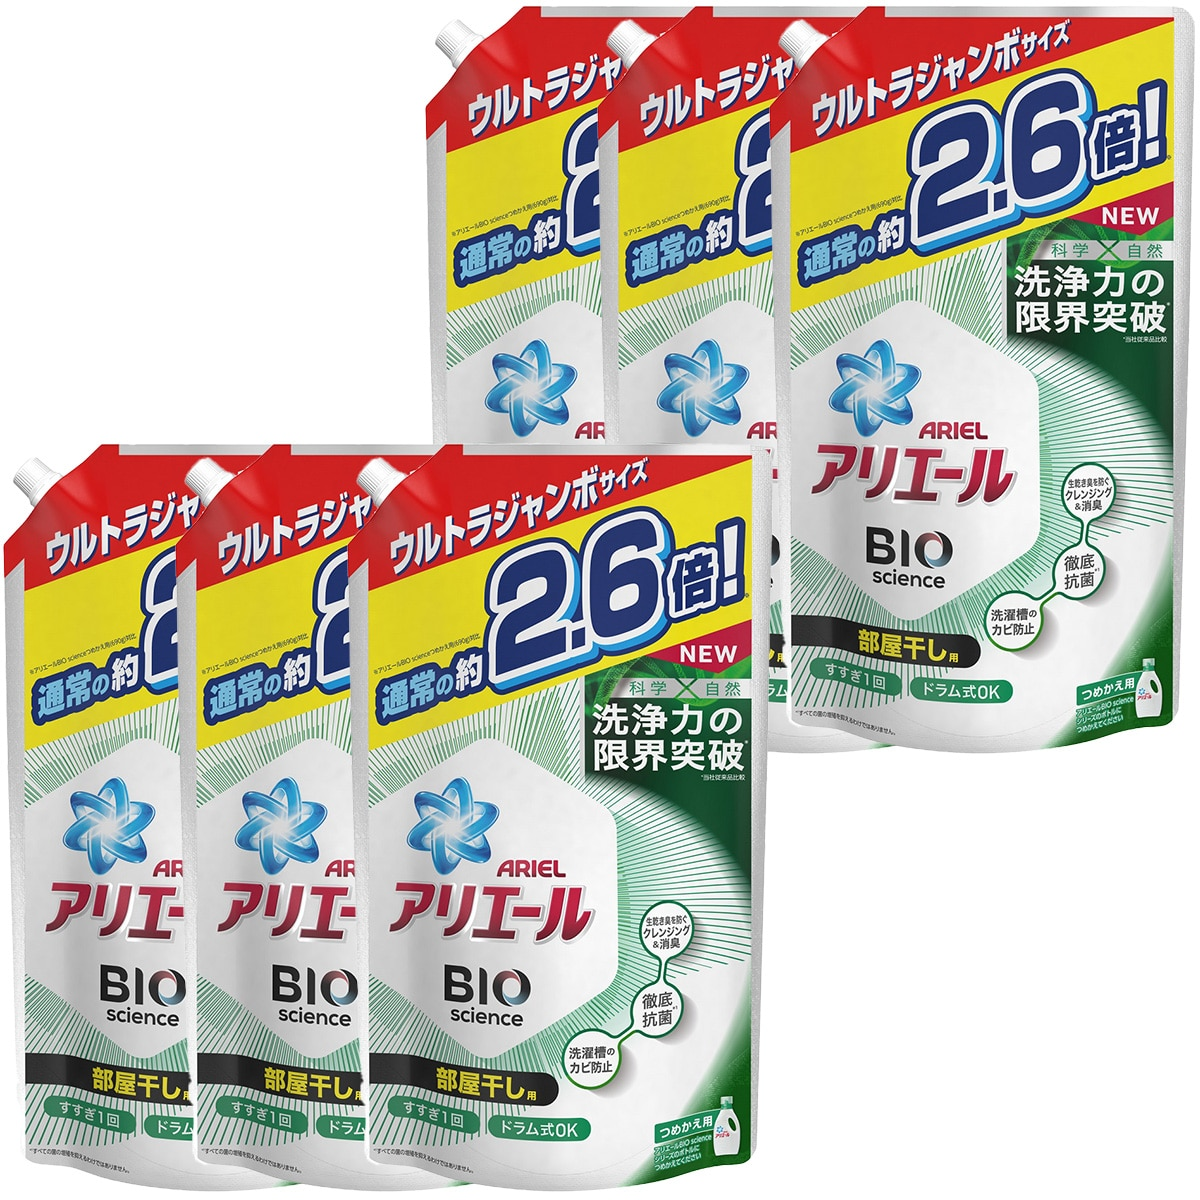 P&G アリエール 液体 洗濯洗剤 部屋干し つめかえ 超ジャンボ 1800mL×6袋